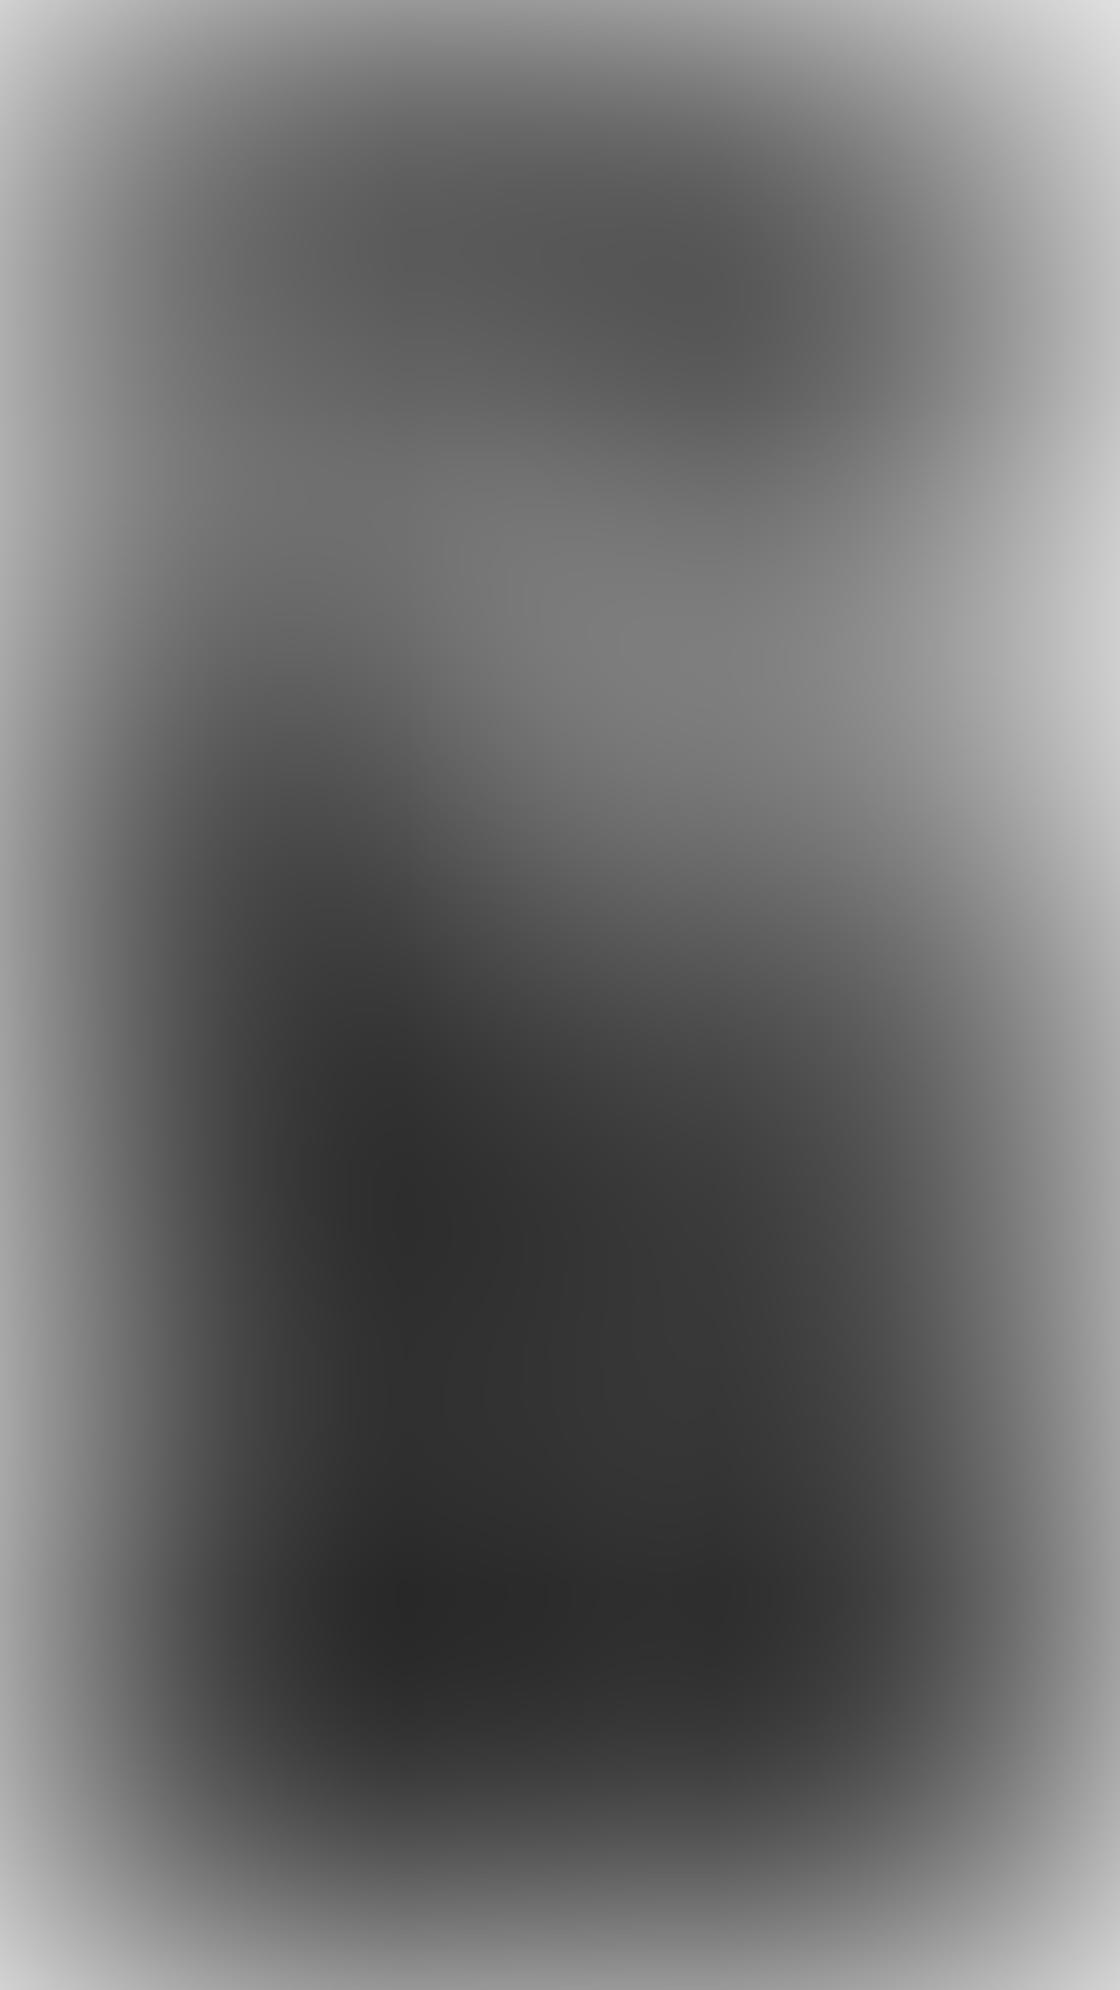 iPhone Photo Perspective 16